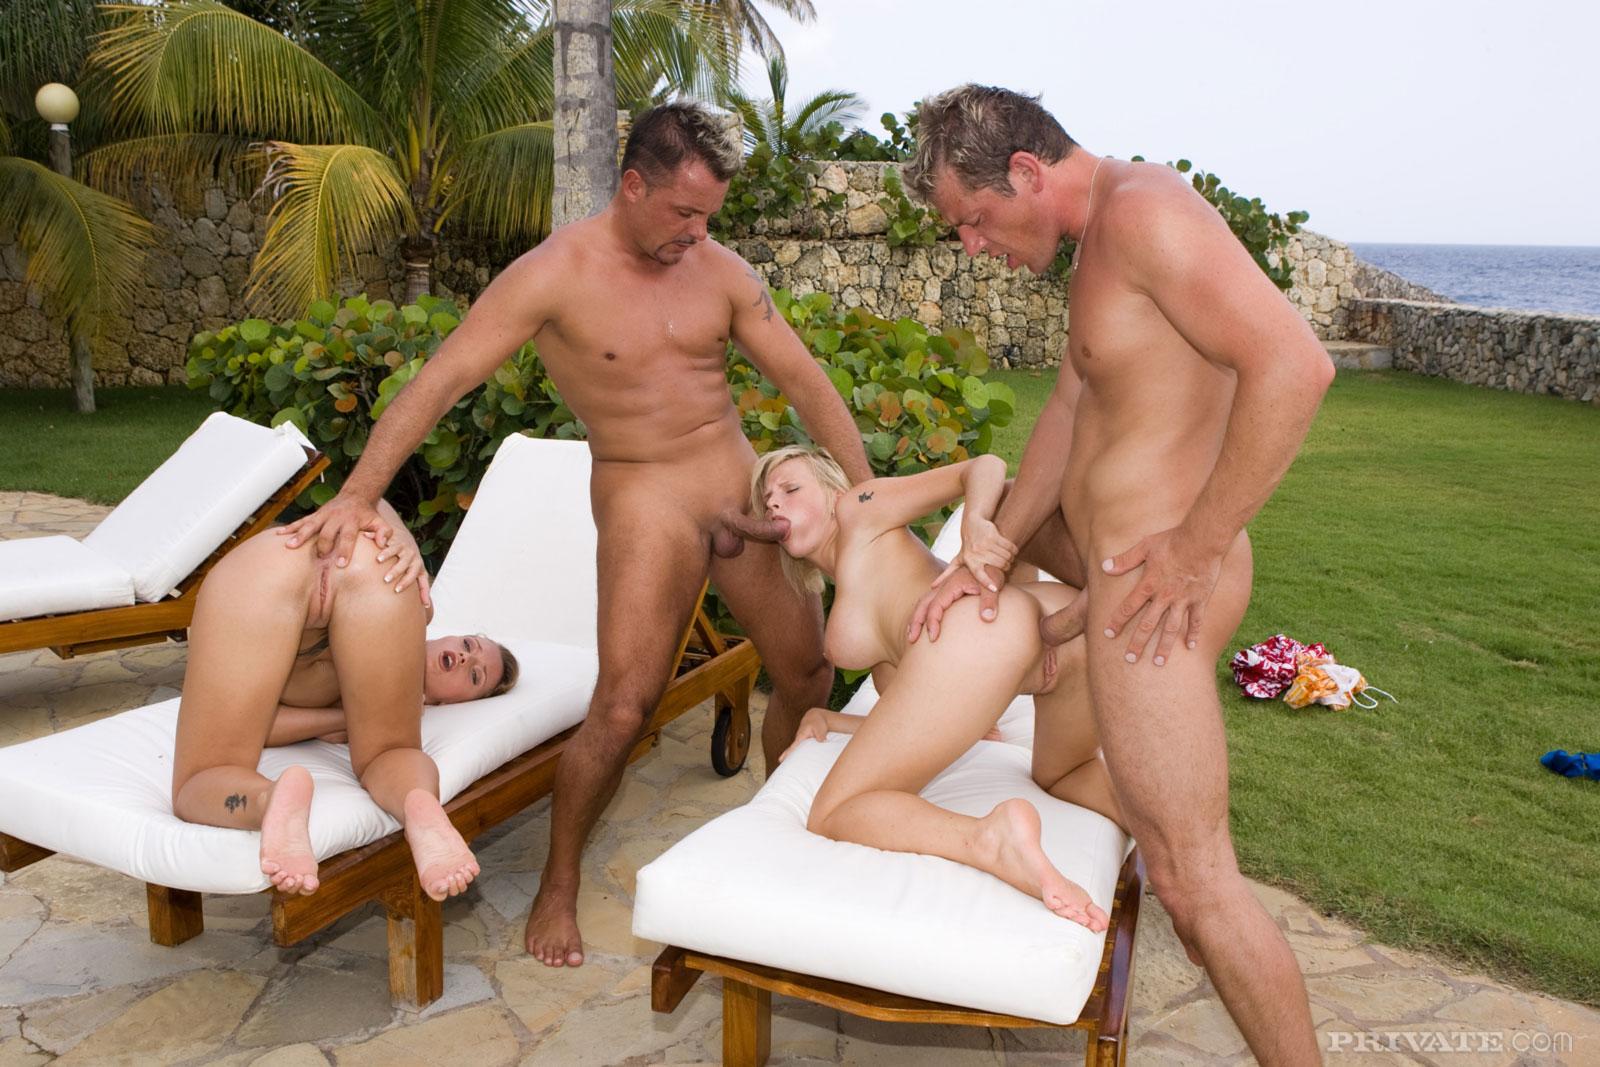 erotic interracial group sex story